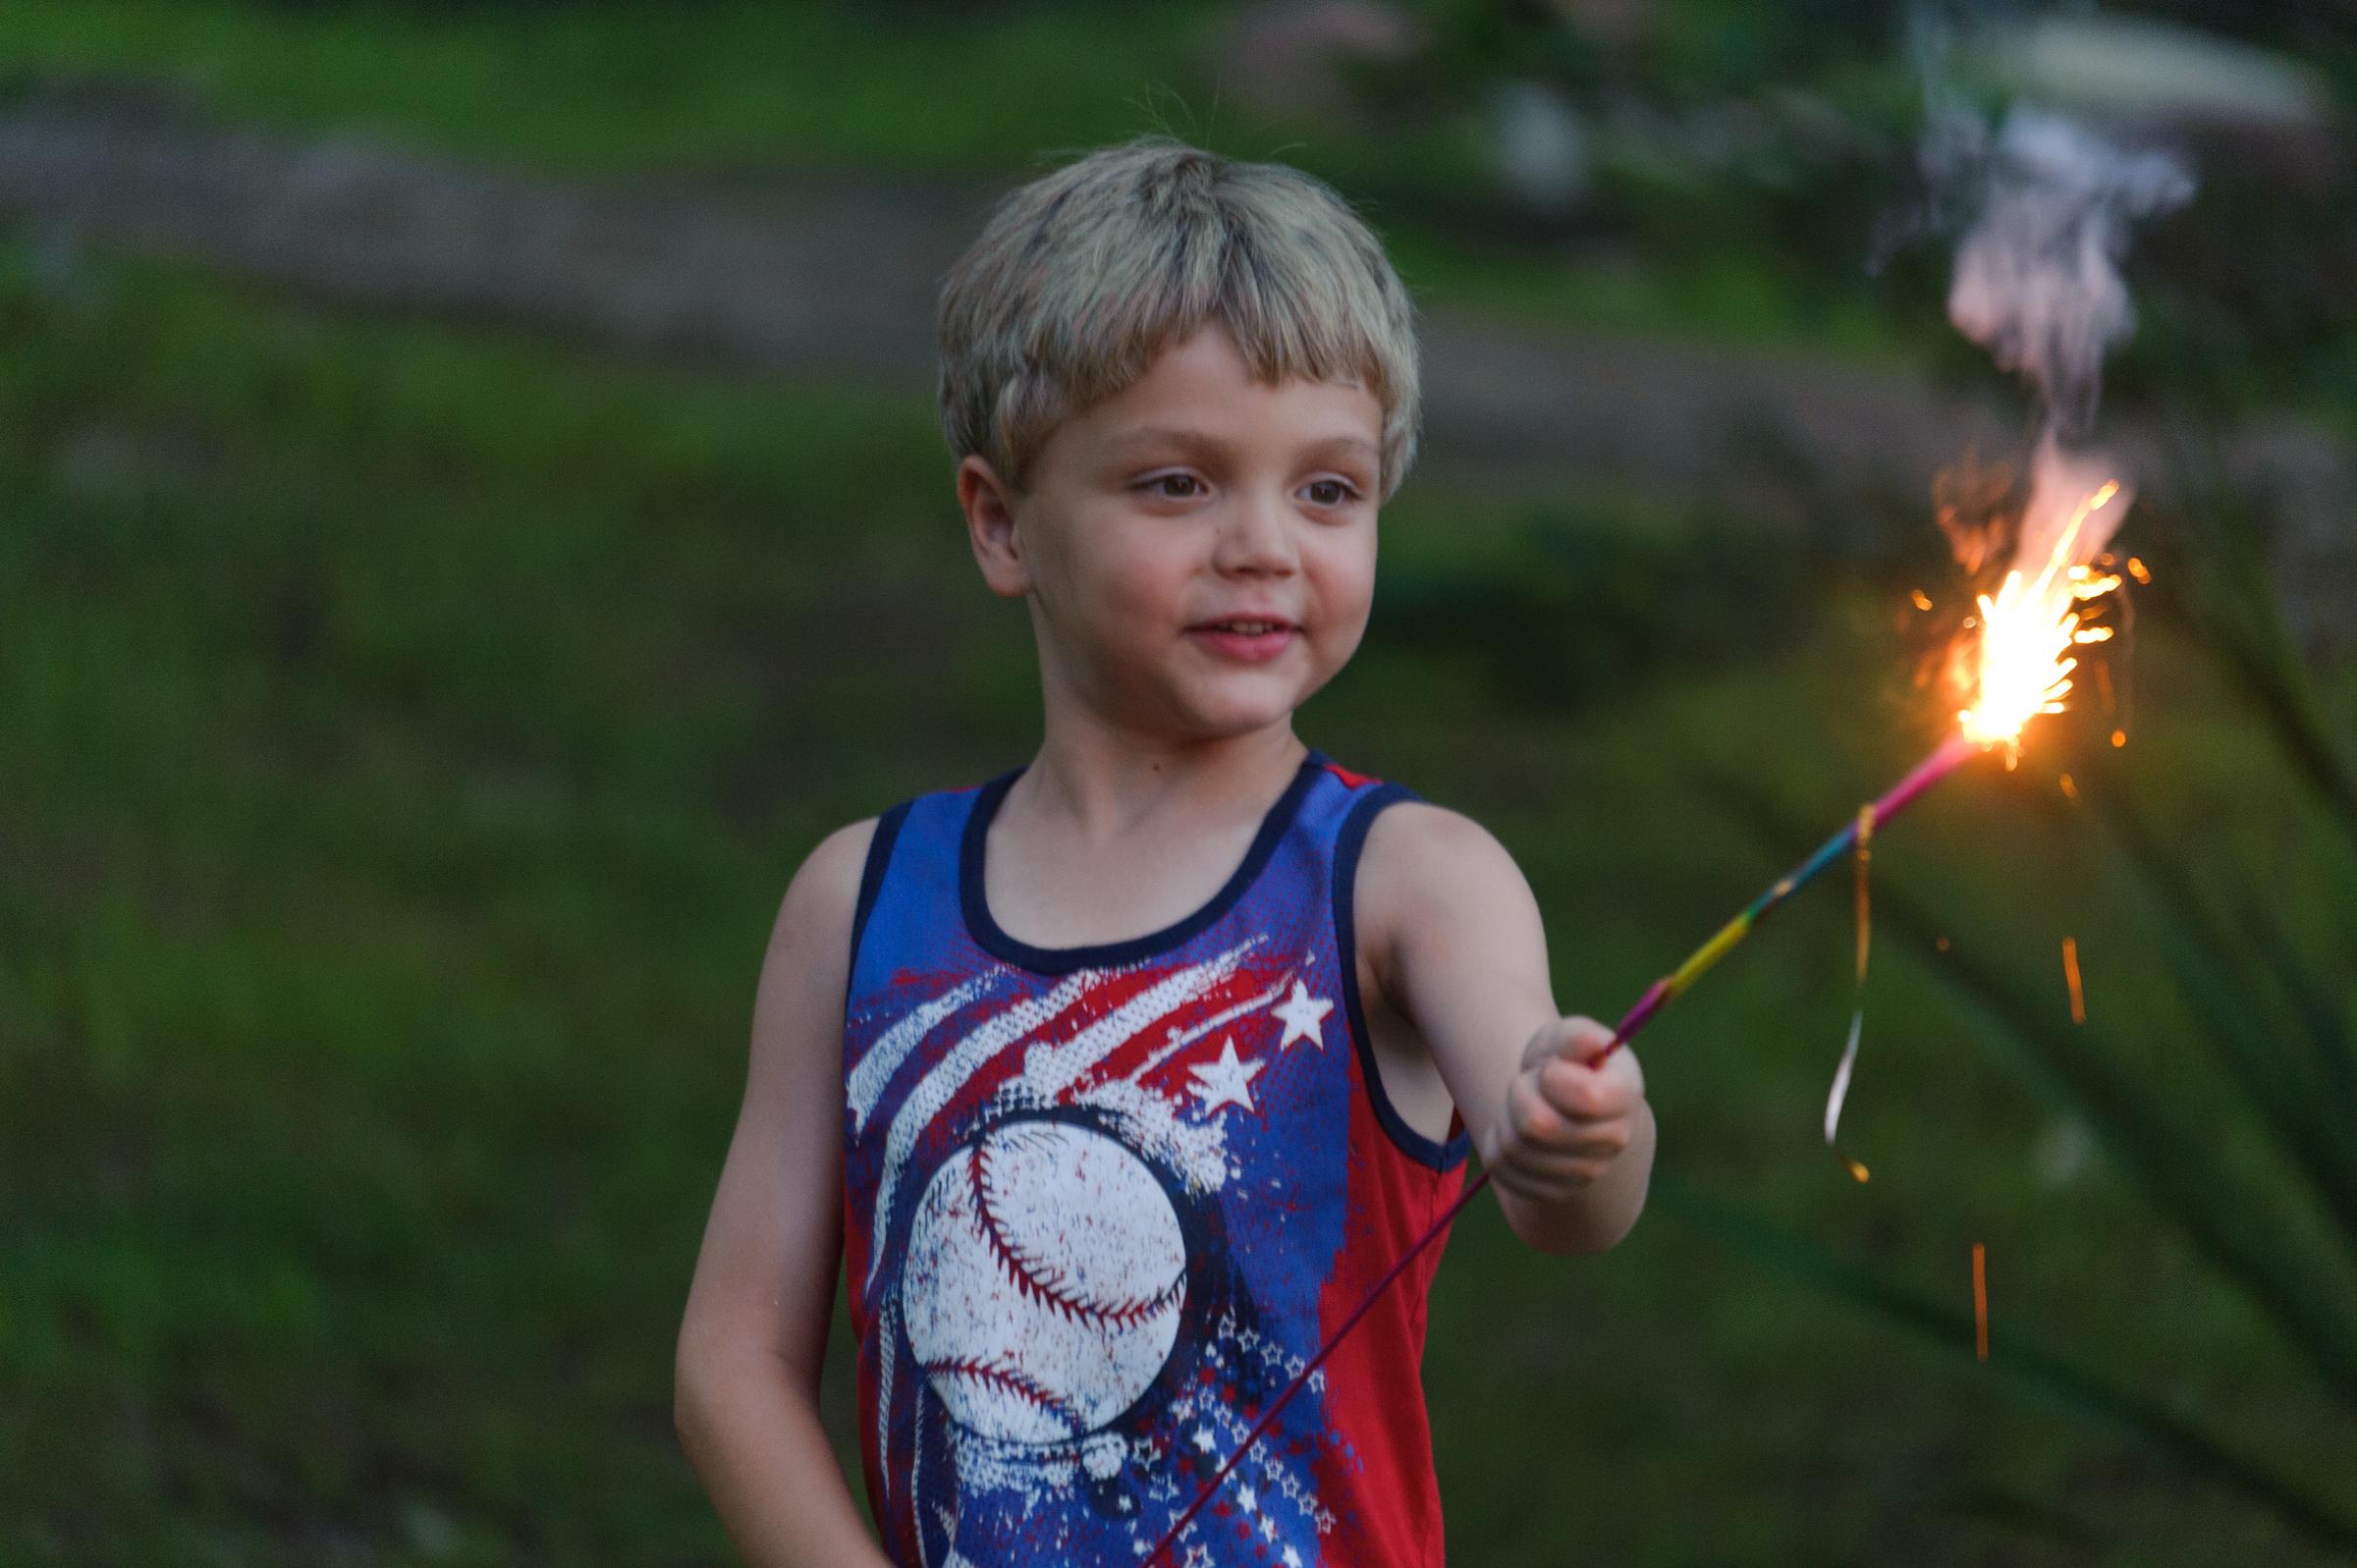 DSC10-0151. fourth of July kid.jpg